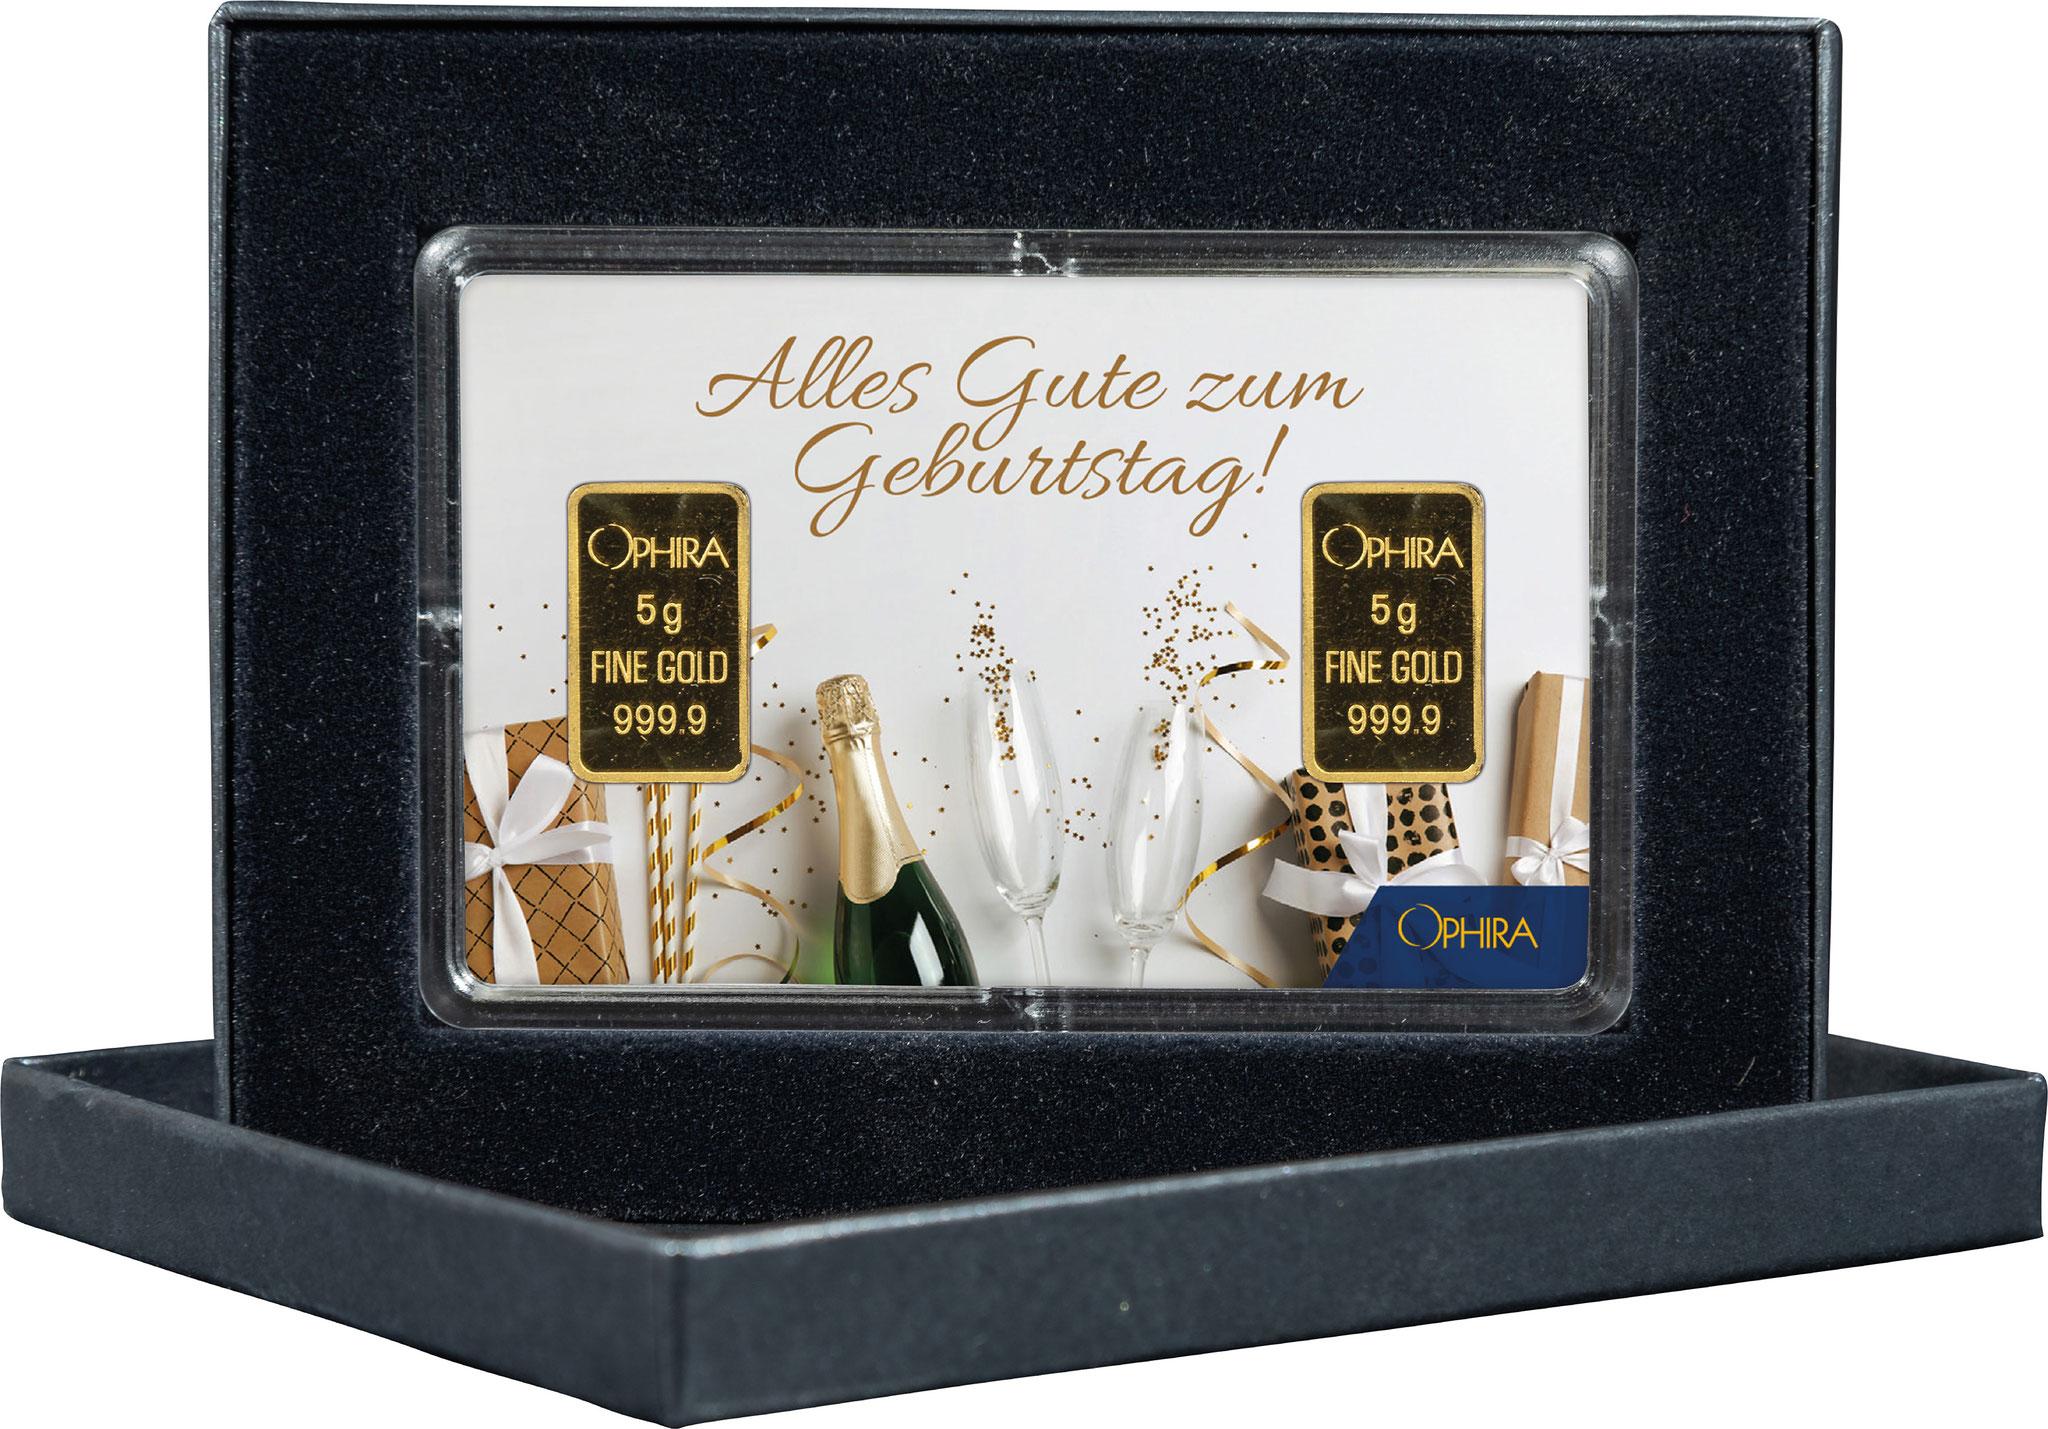 Geschenkbarren Geburtstag mit zwei Goldbarren in edlem Etui